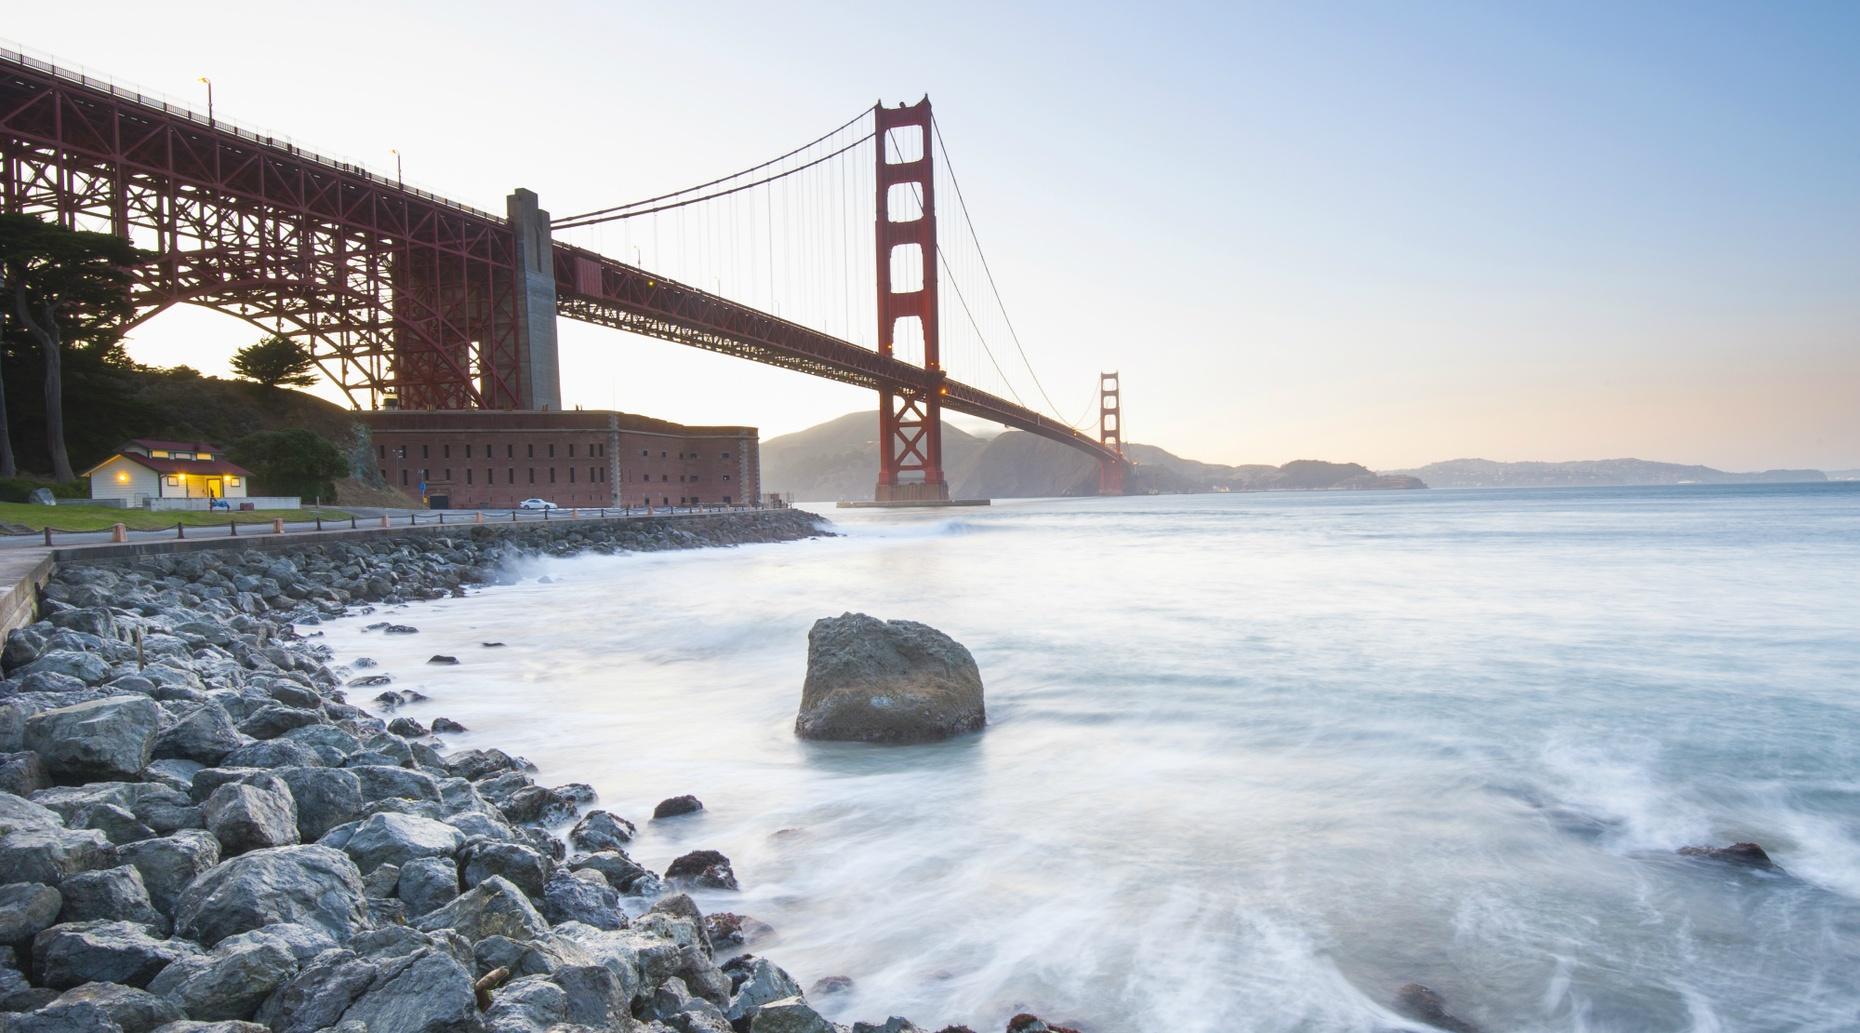 One-Way San Francisco to Yosemite Shuttle